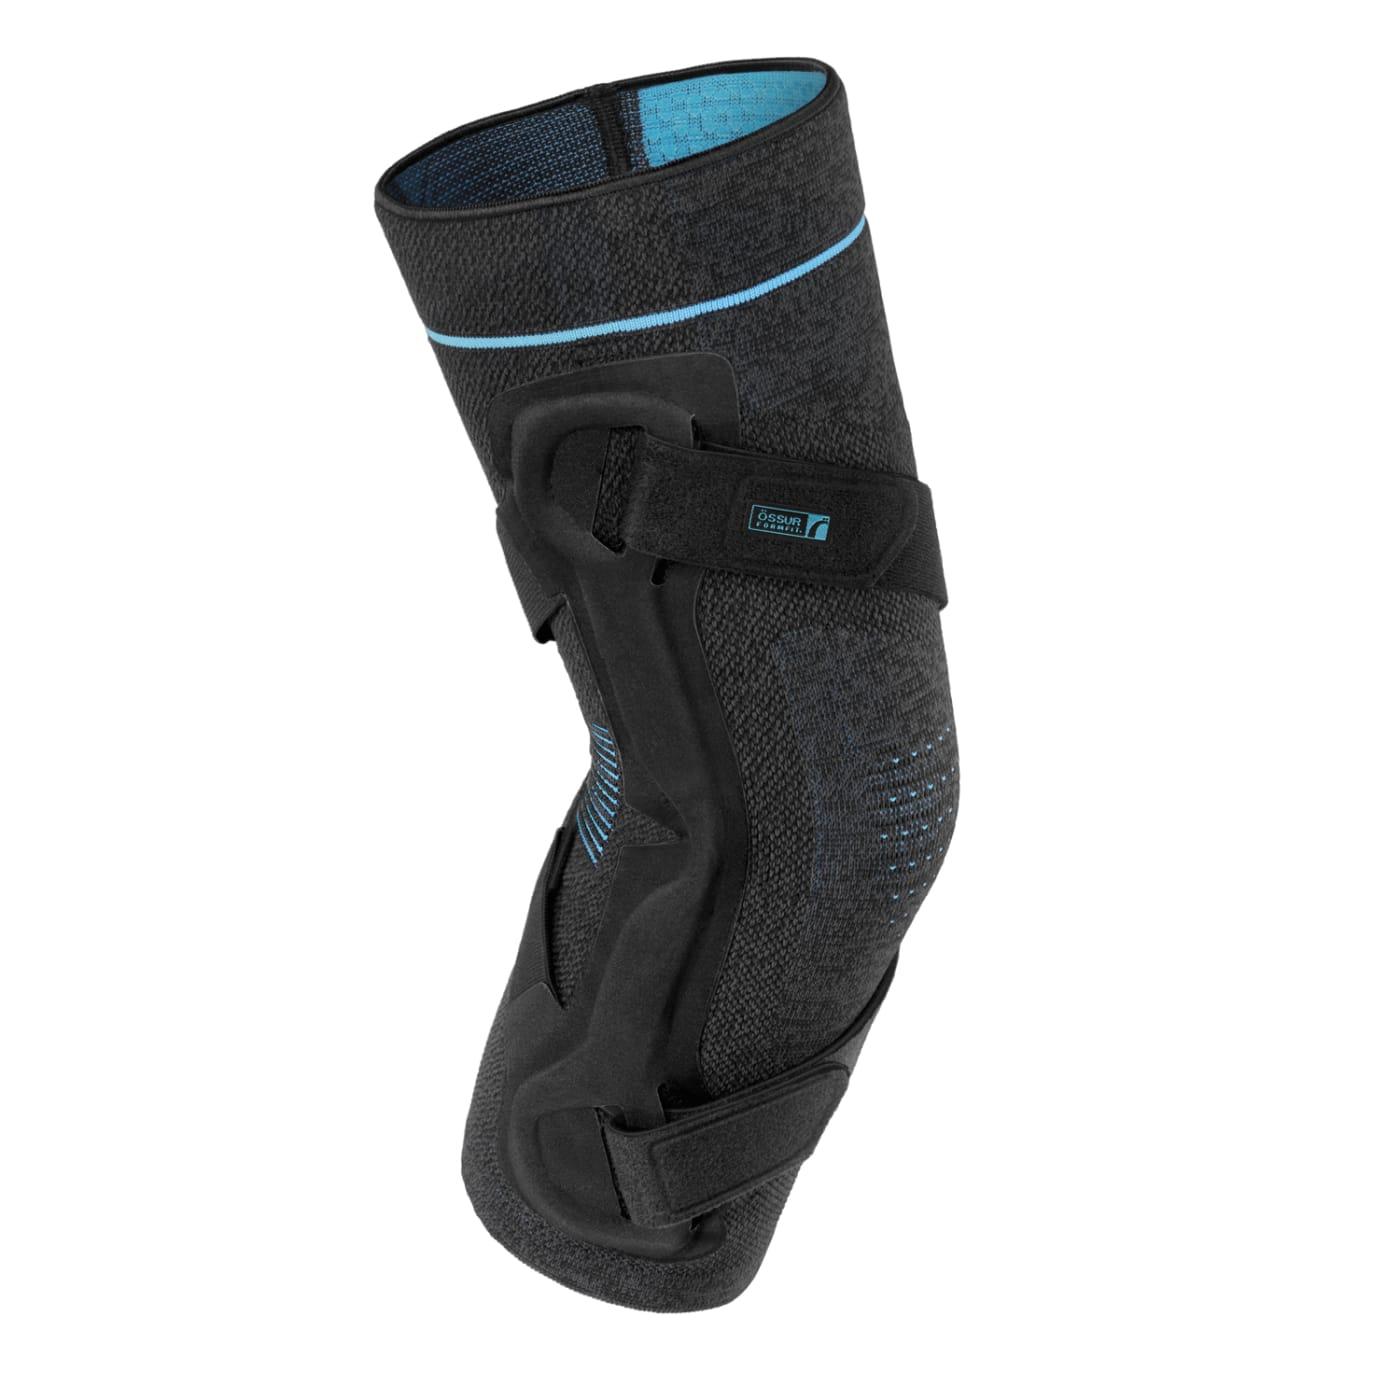 Ossur Formfit Pro Knee OA